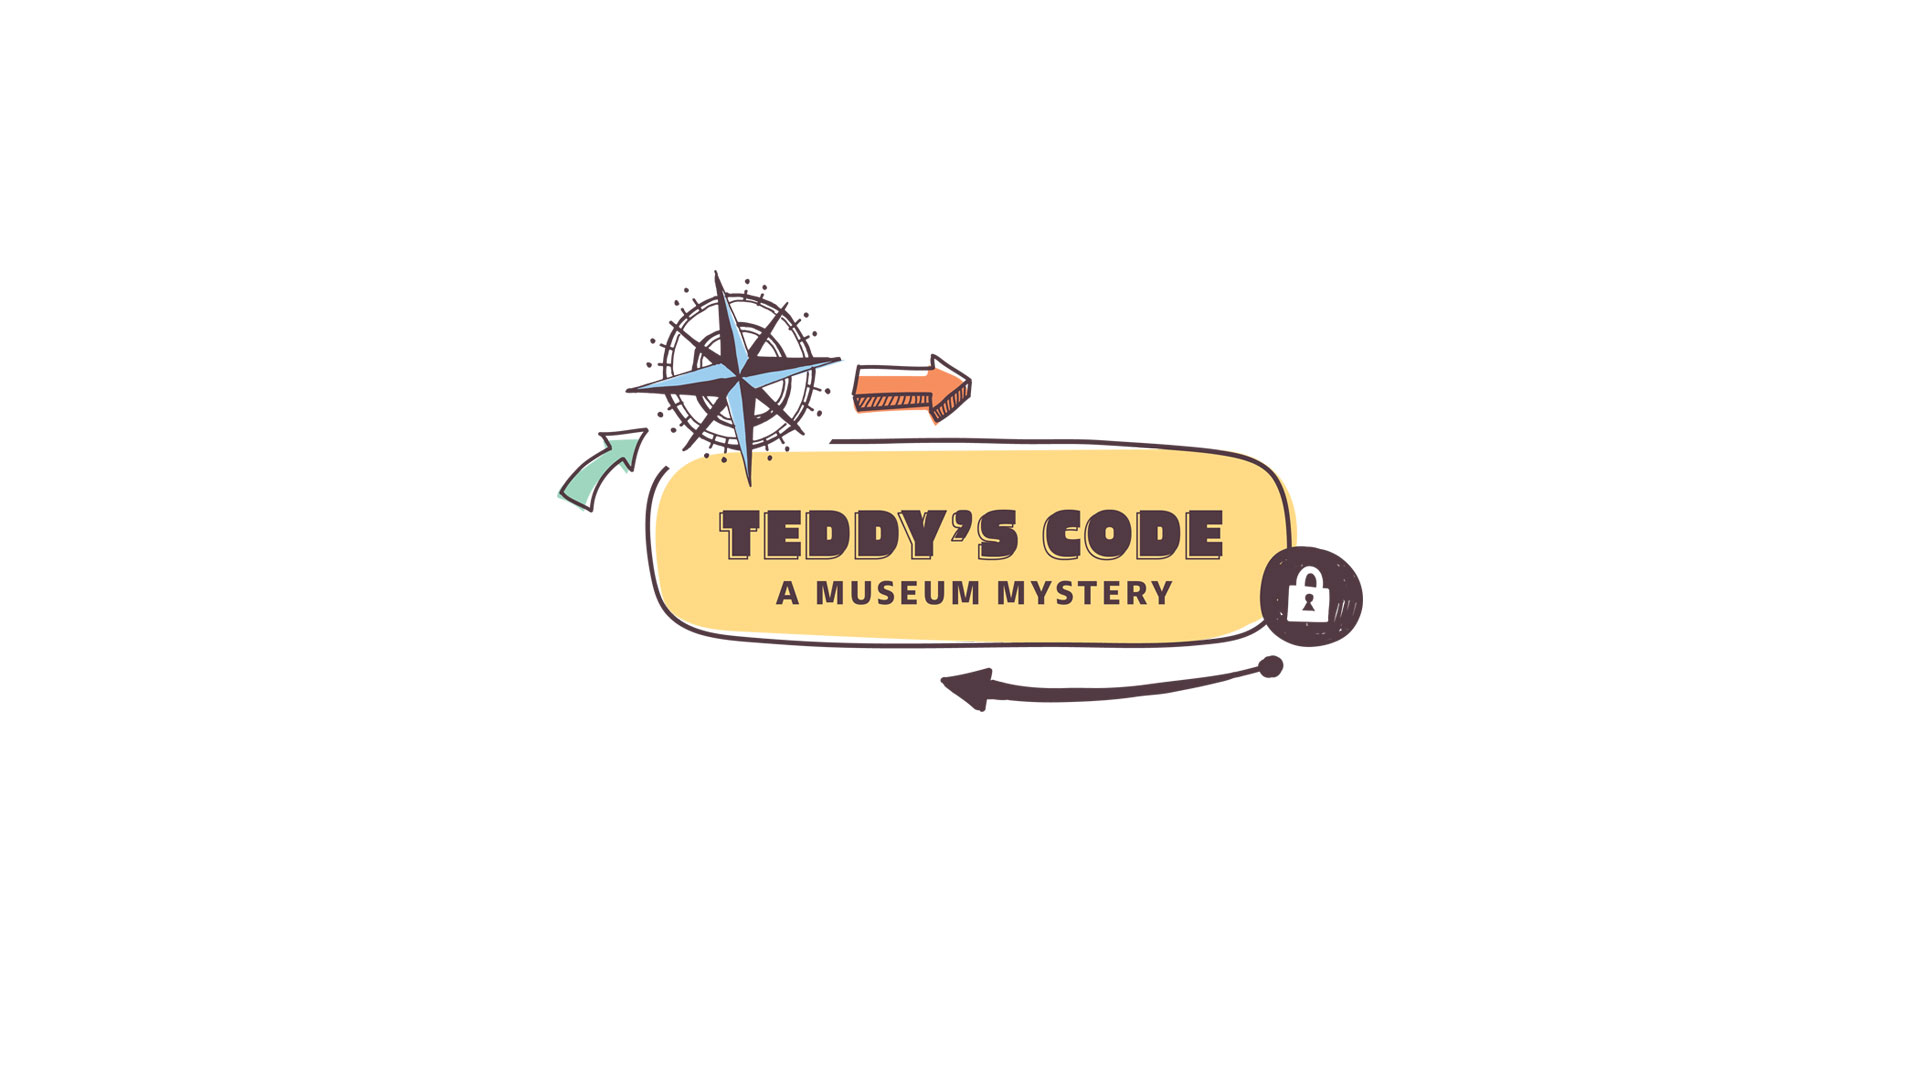 Teddy's Code